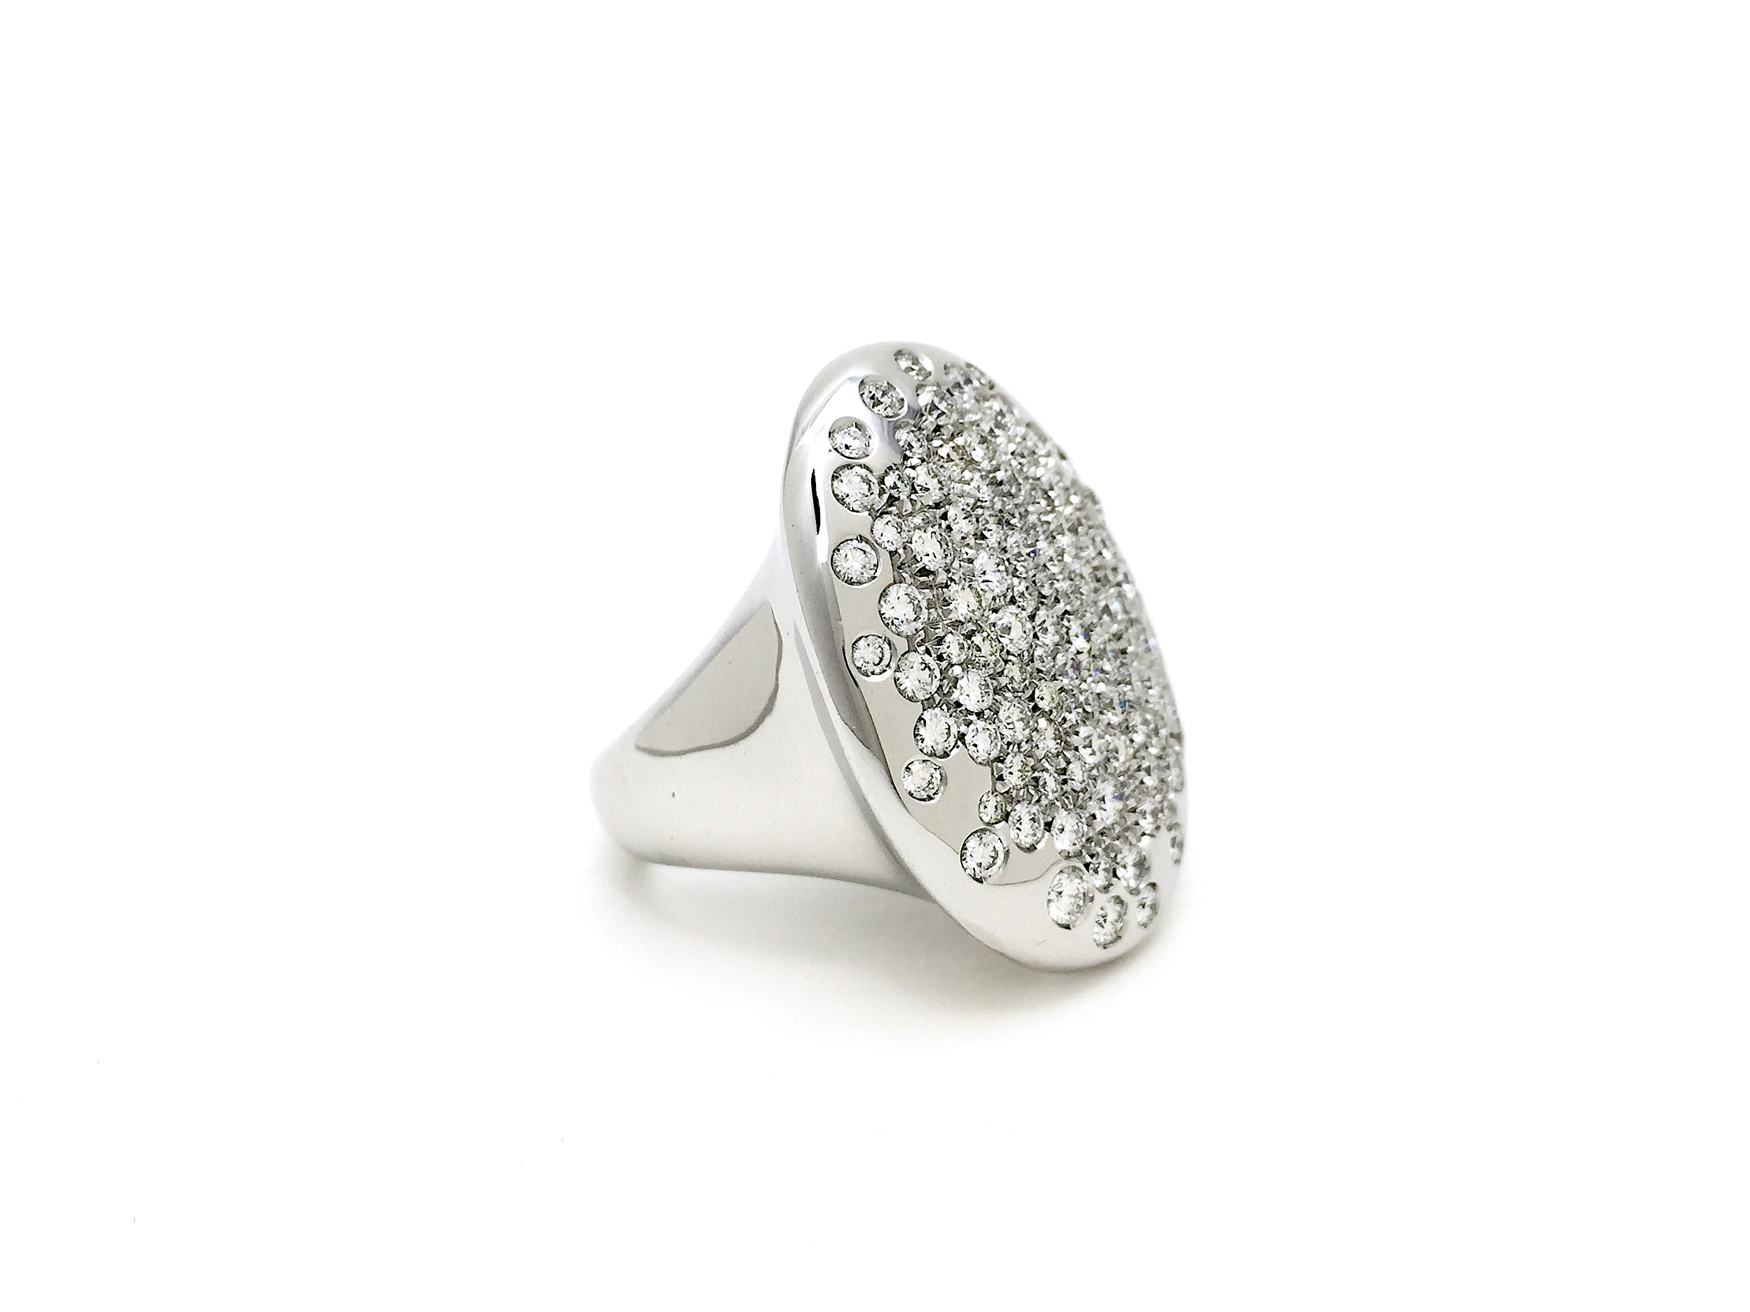 Sensi joyas alta joyería Granada plata compromiso ANILLO ORO 18K  BRILLANTES   2,15 CTS